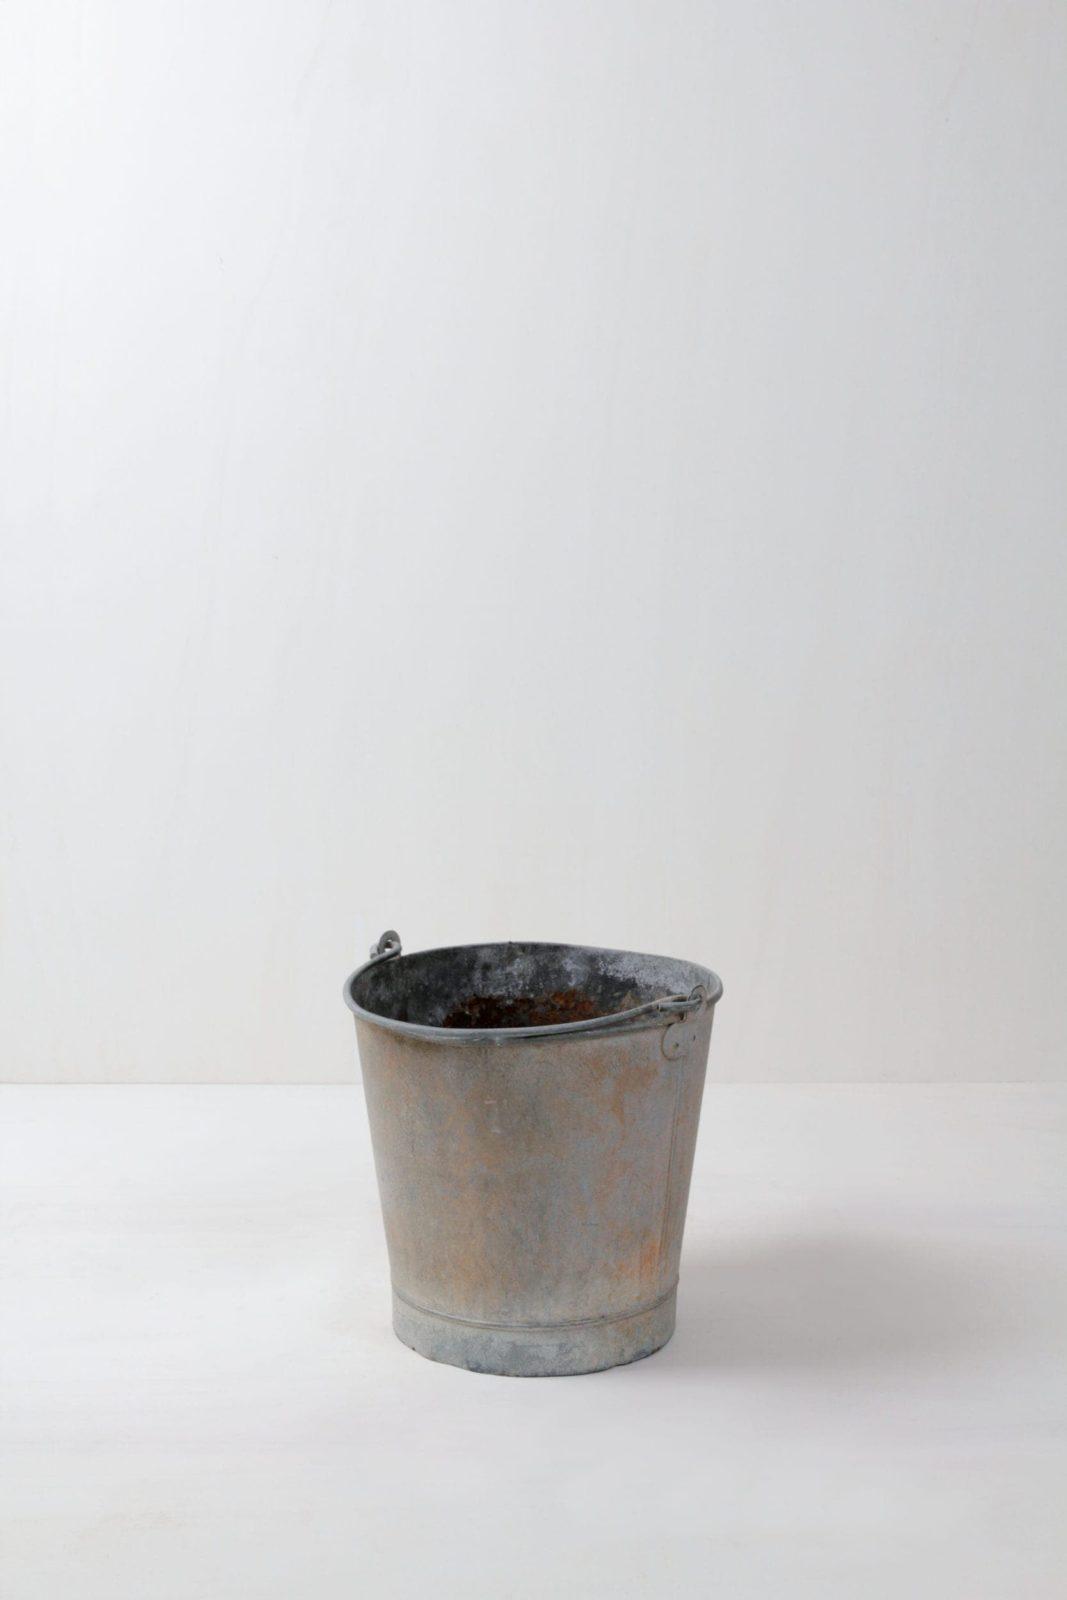 Metal Bucket Franco | Authentic vintage bucket with real patina. | gotvintage Rental & Event Design